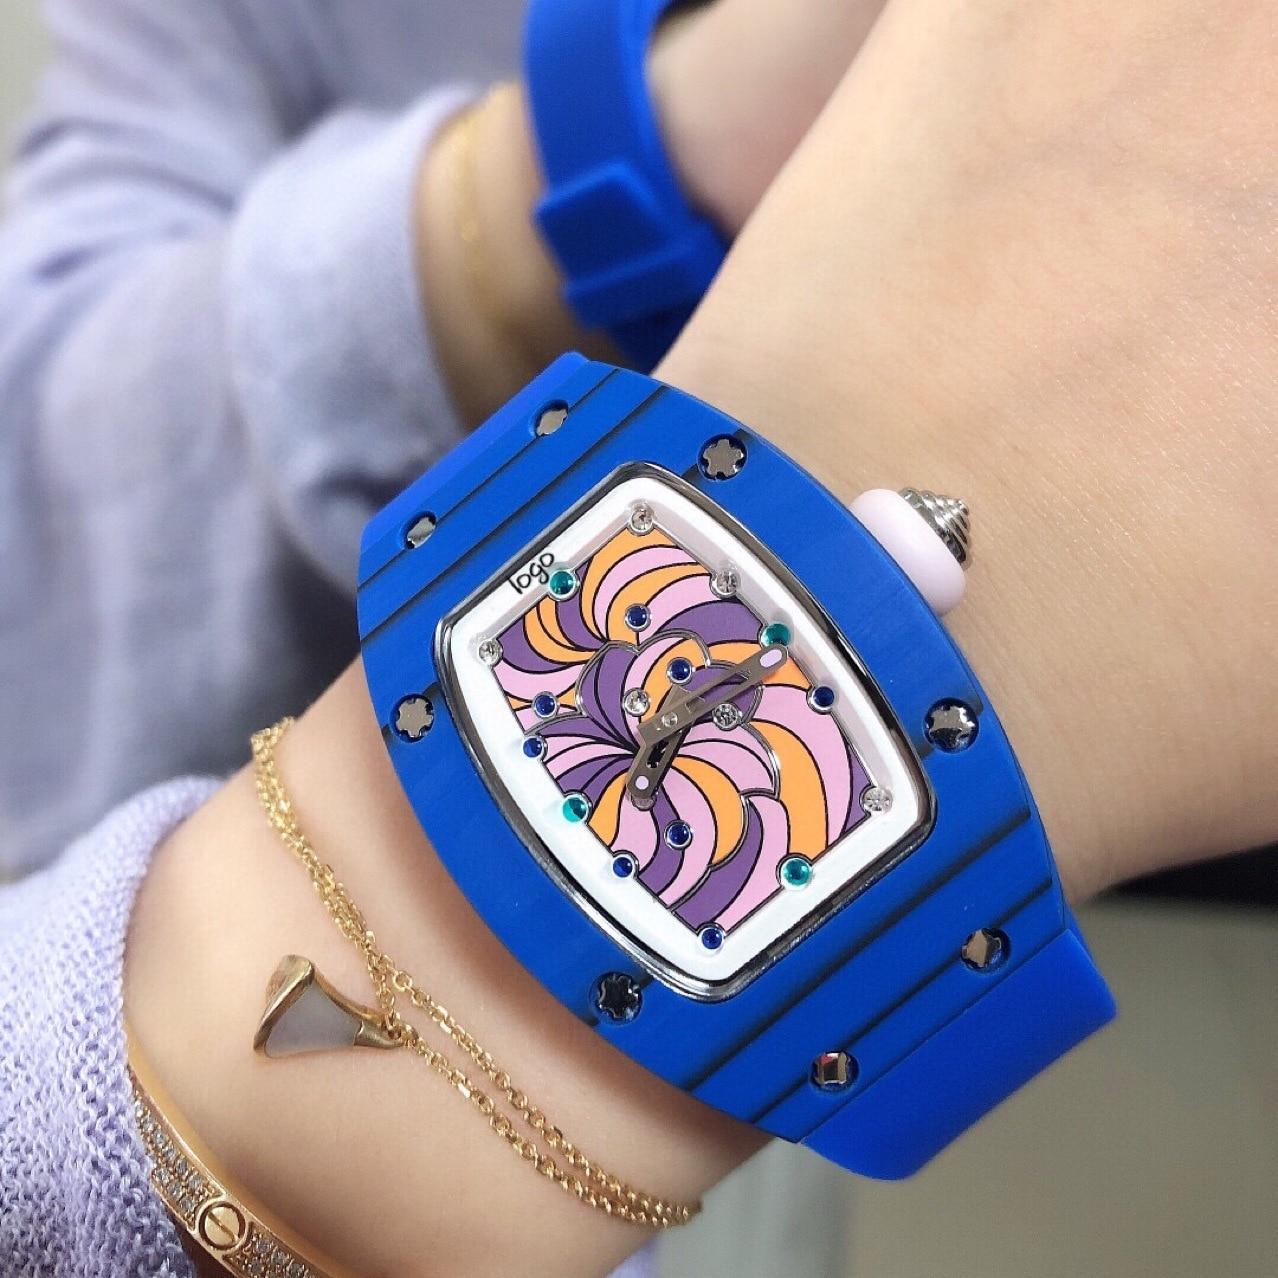 2021 new ladies fashion watch Richard RM07-01 automatic mechanical blue carbon fiber blue tape waterproof watch ladies watch enlarge